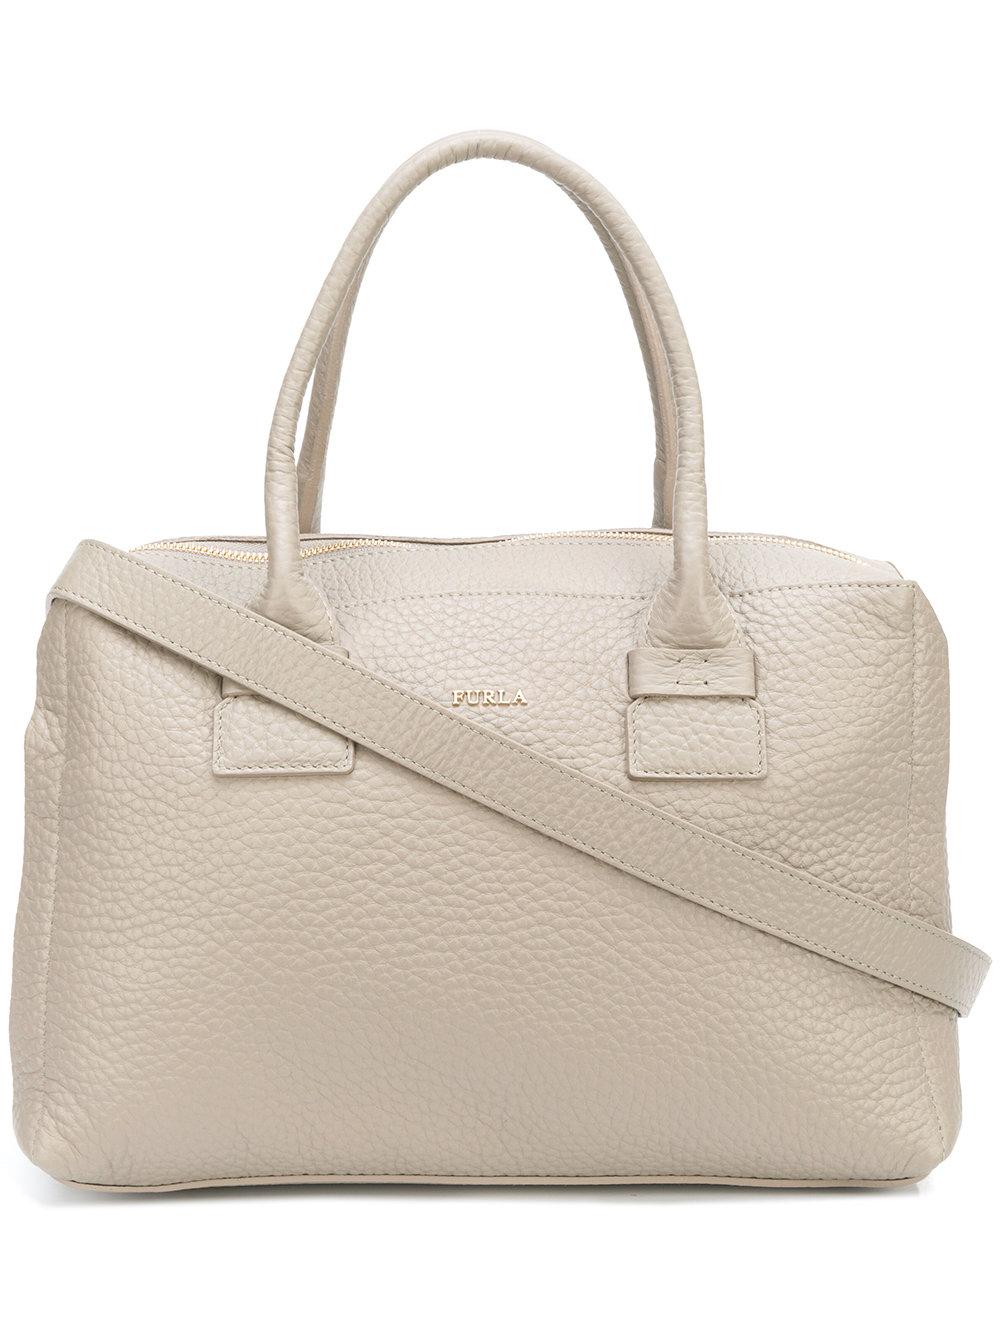 Furla Capriccio tote bag - Neutrals - Glami.sk 3a4fdbd859e